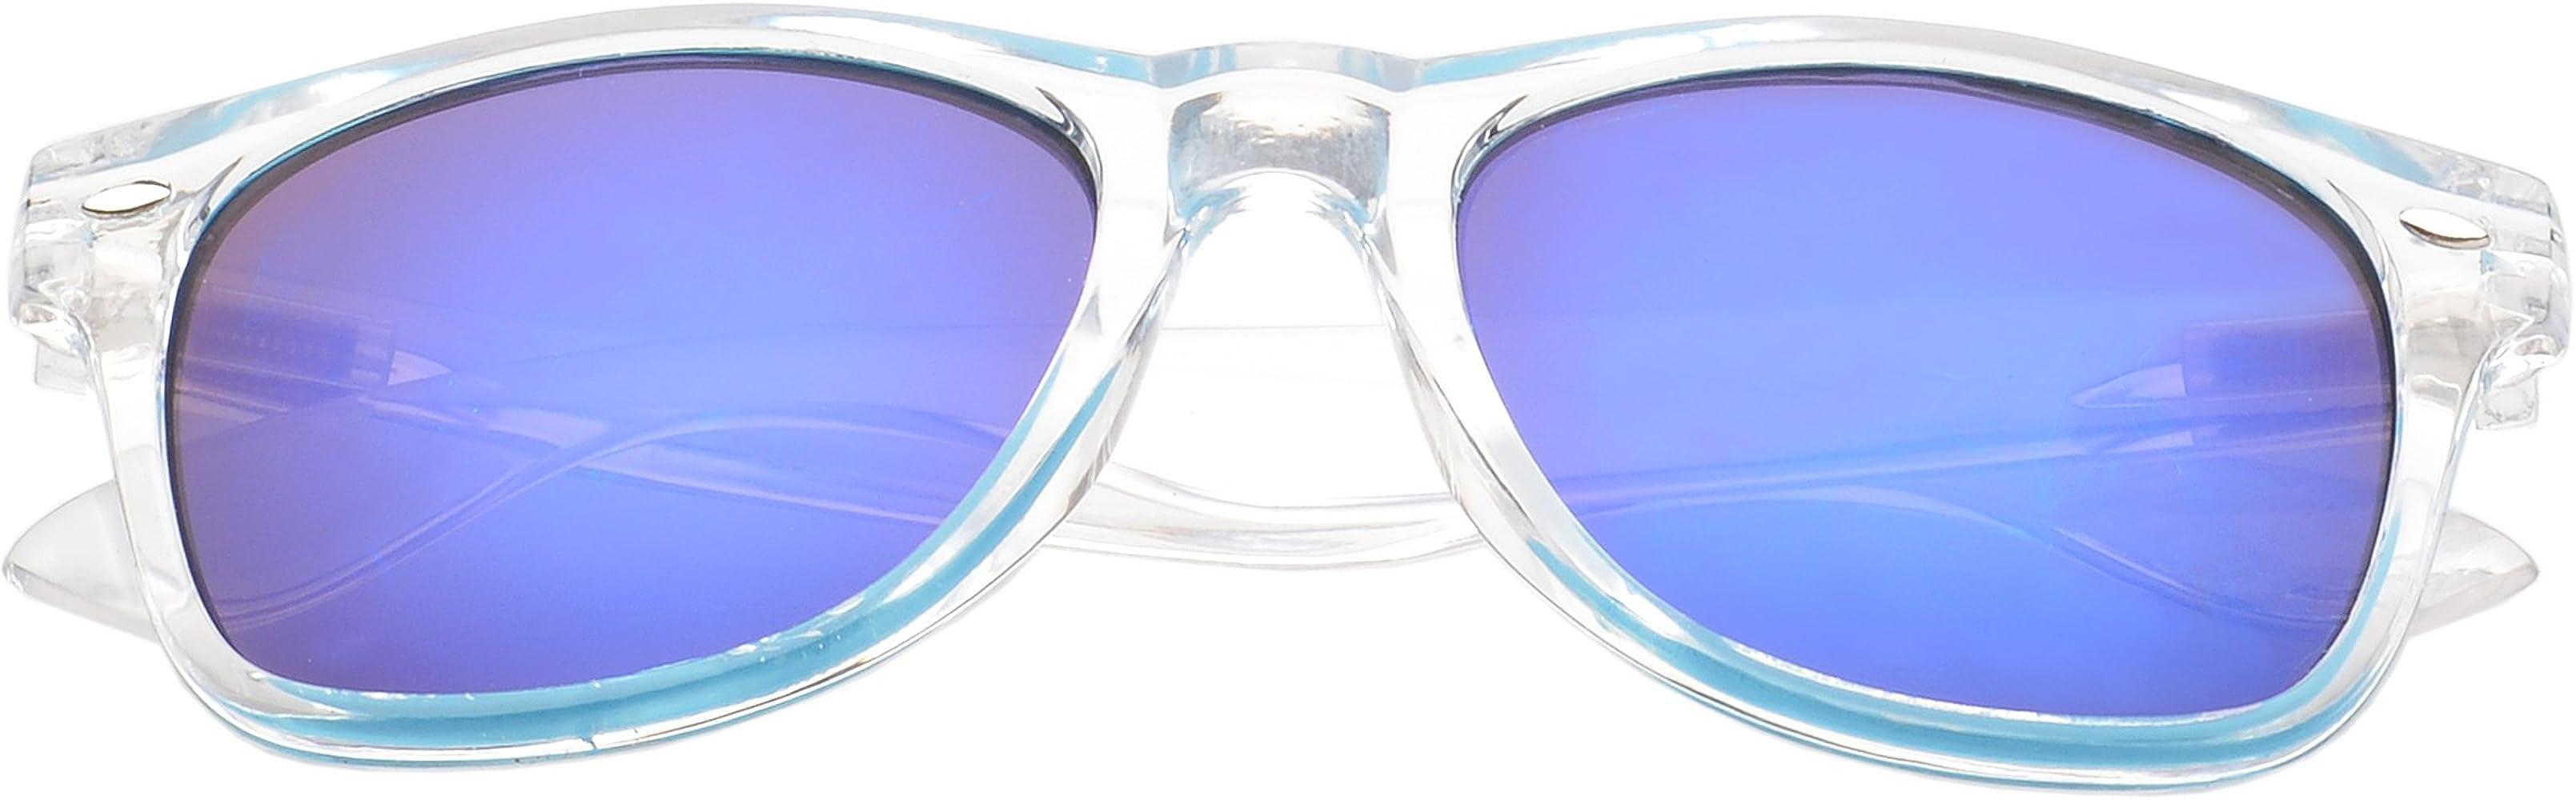 MLC Eyewear St Lucas Retro Square Fashion Sunglasses in Clear Frame Green Lenses